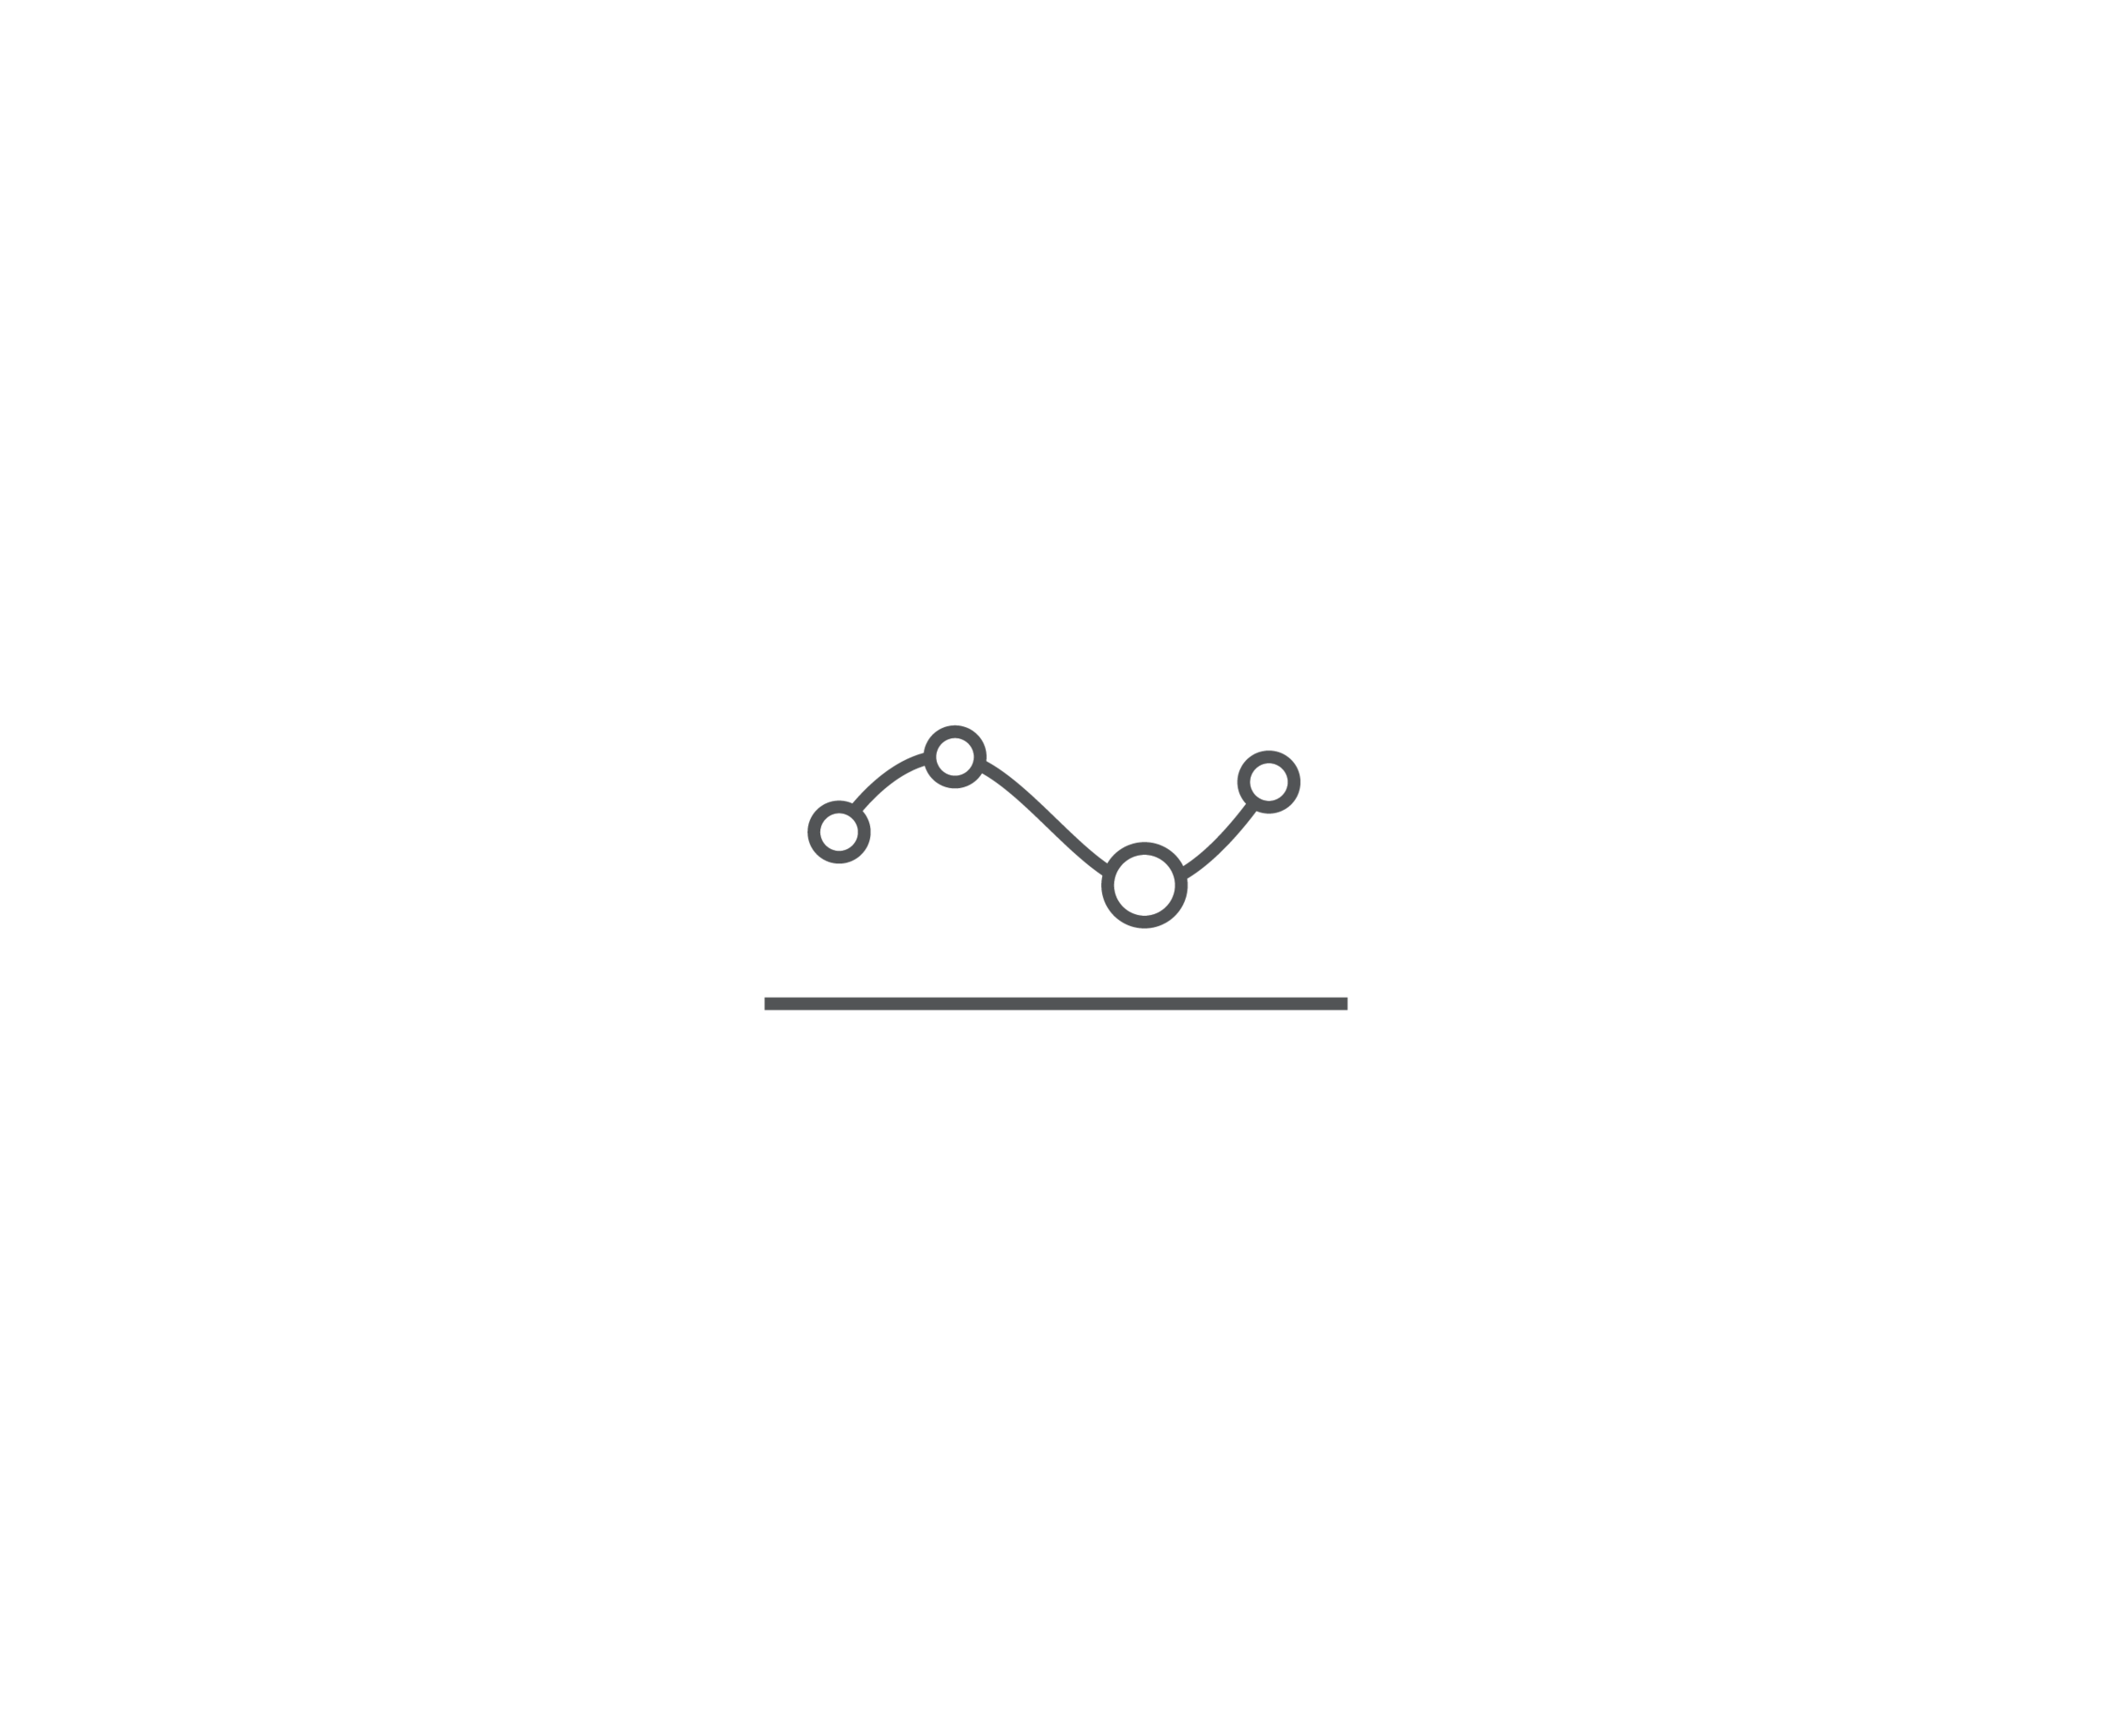 input illustrator-27.png